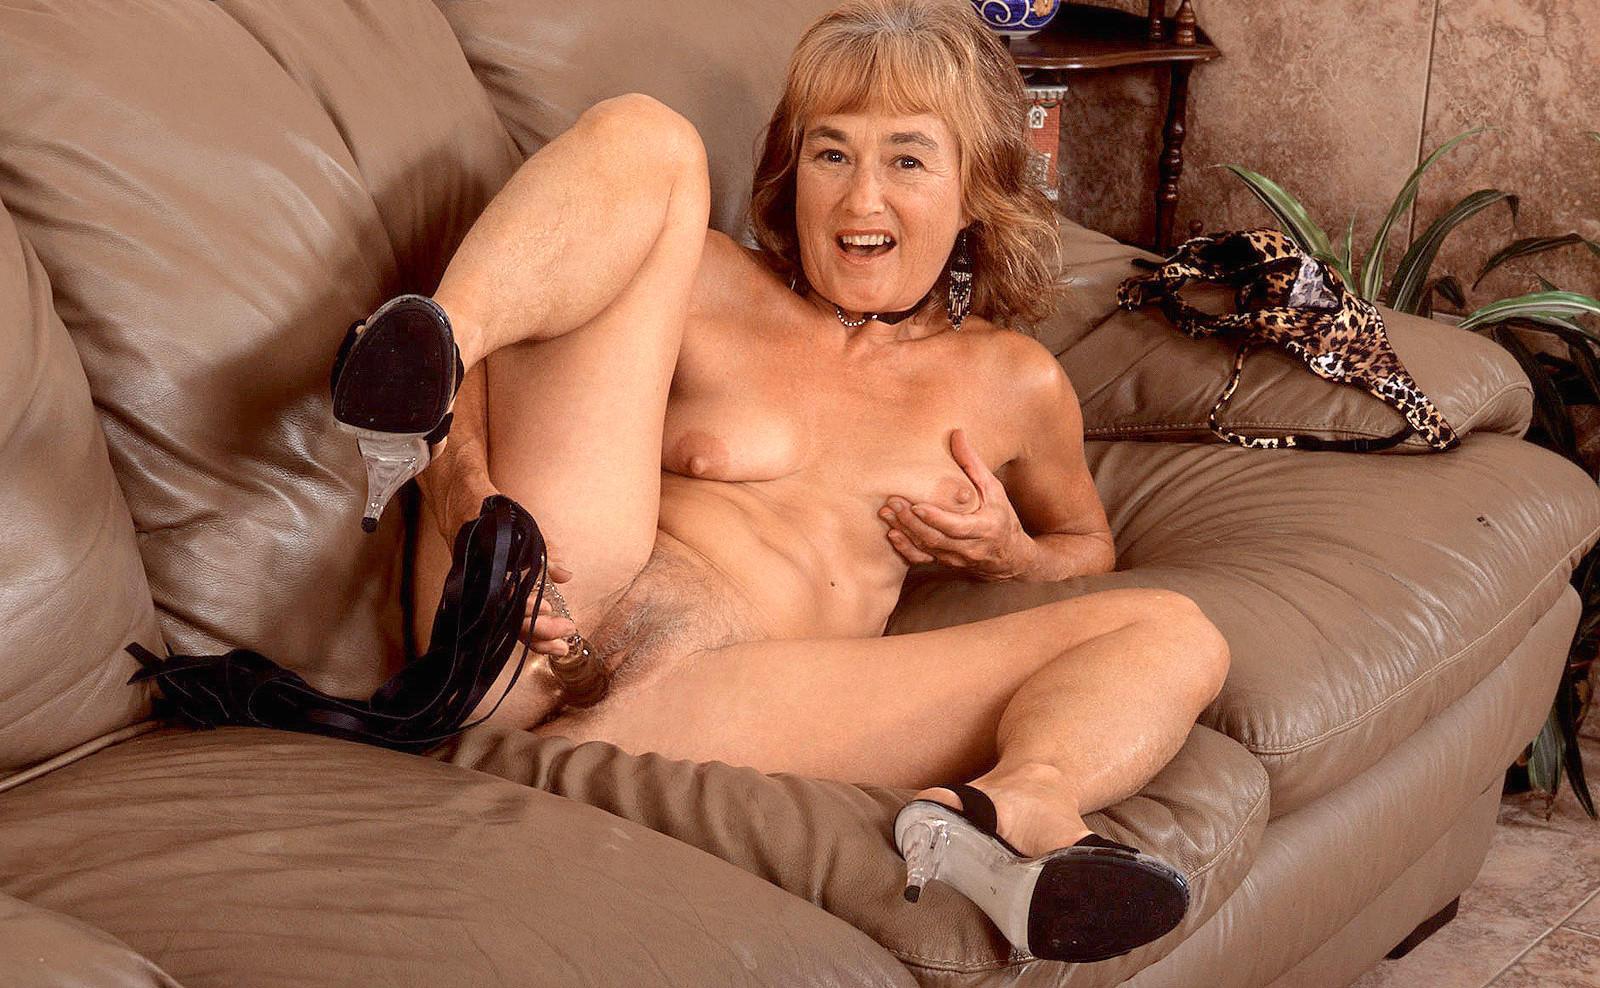 pretty pinay artist naked